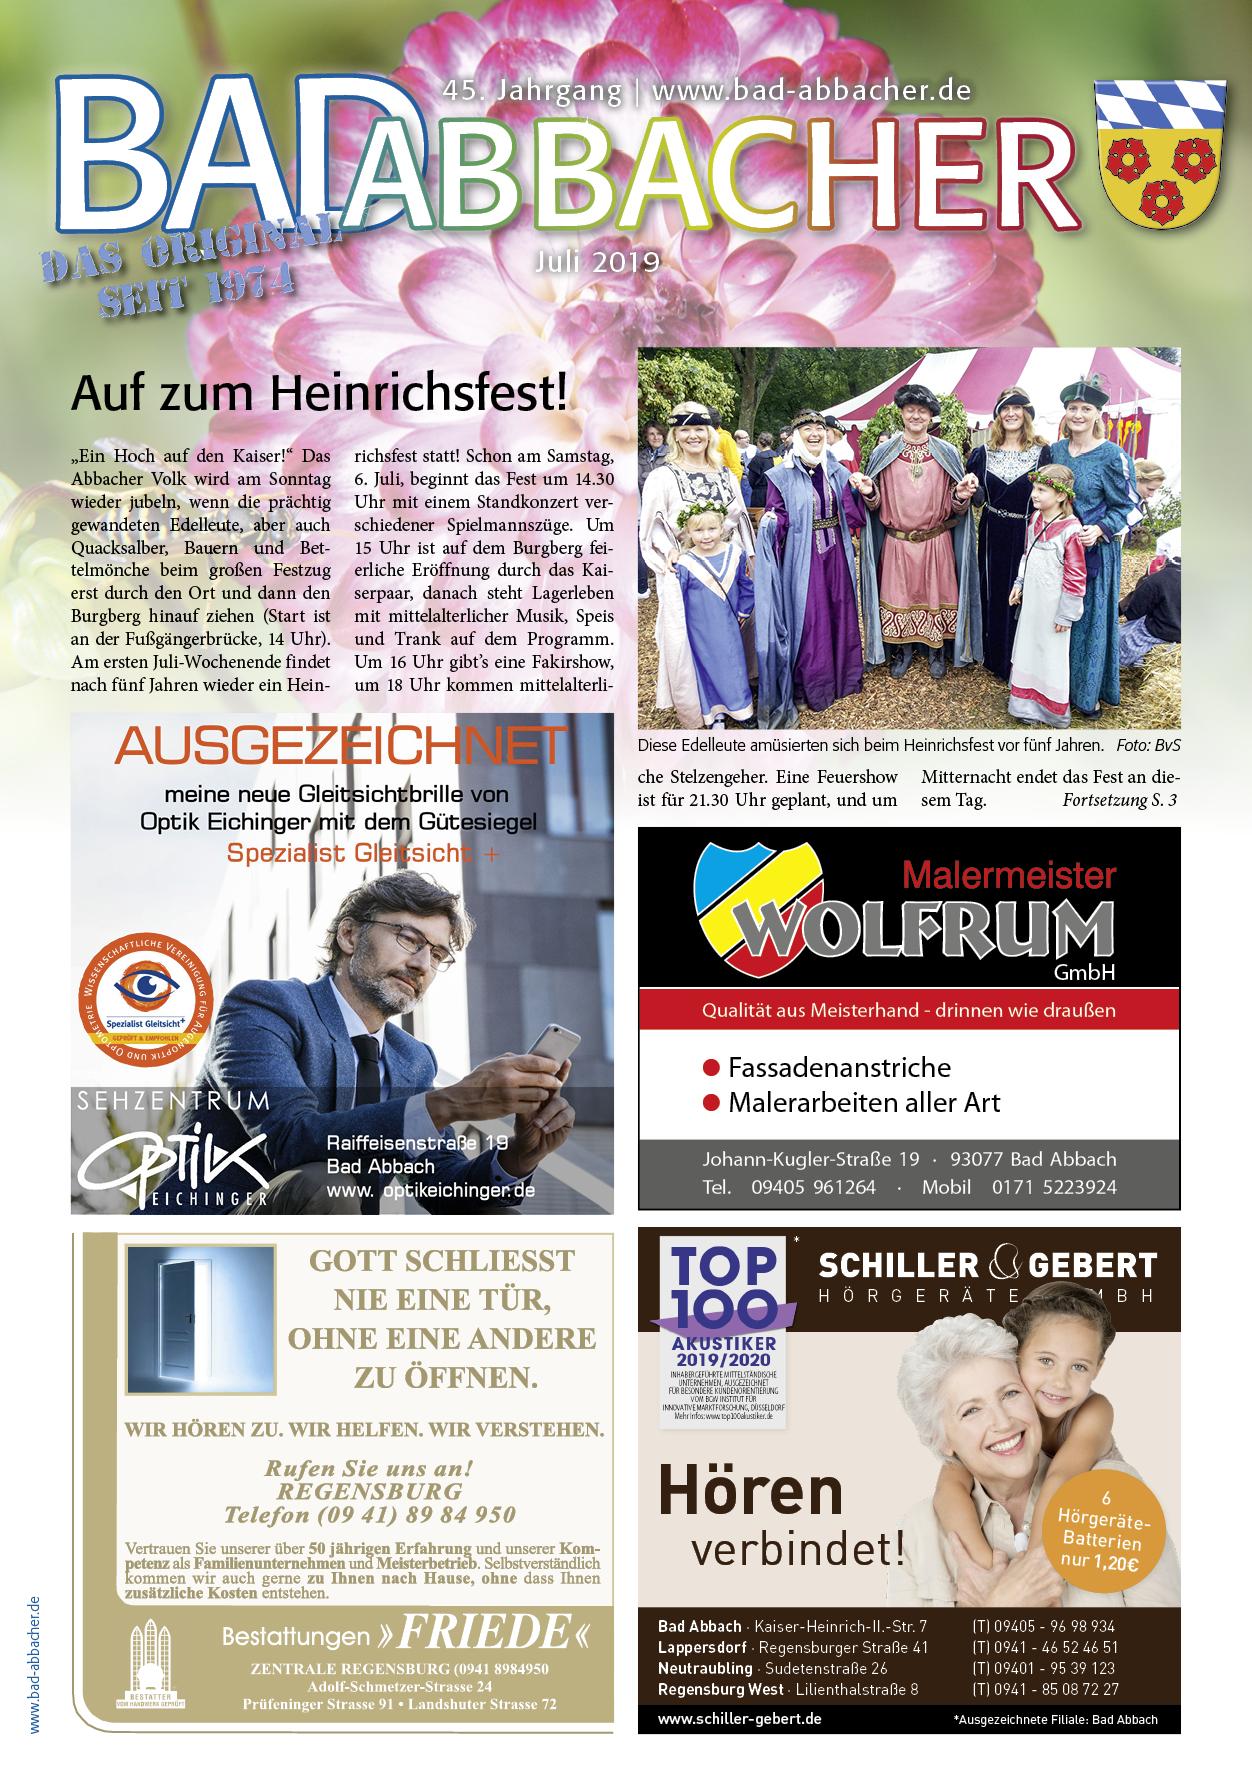 Bad-Abbacher_2019-07